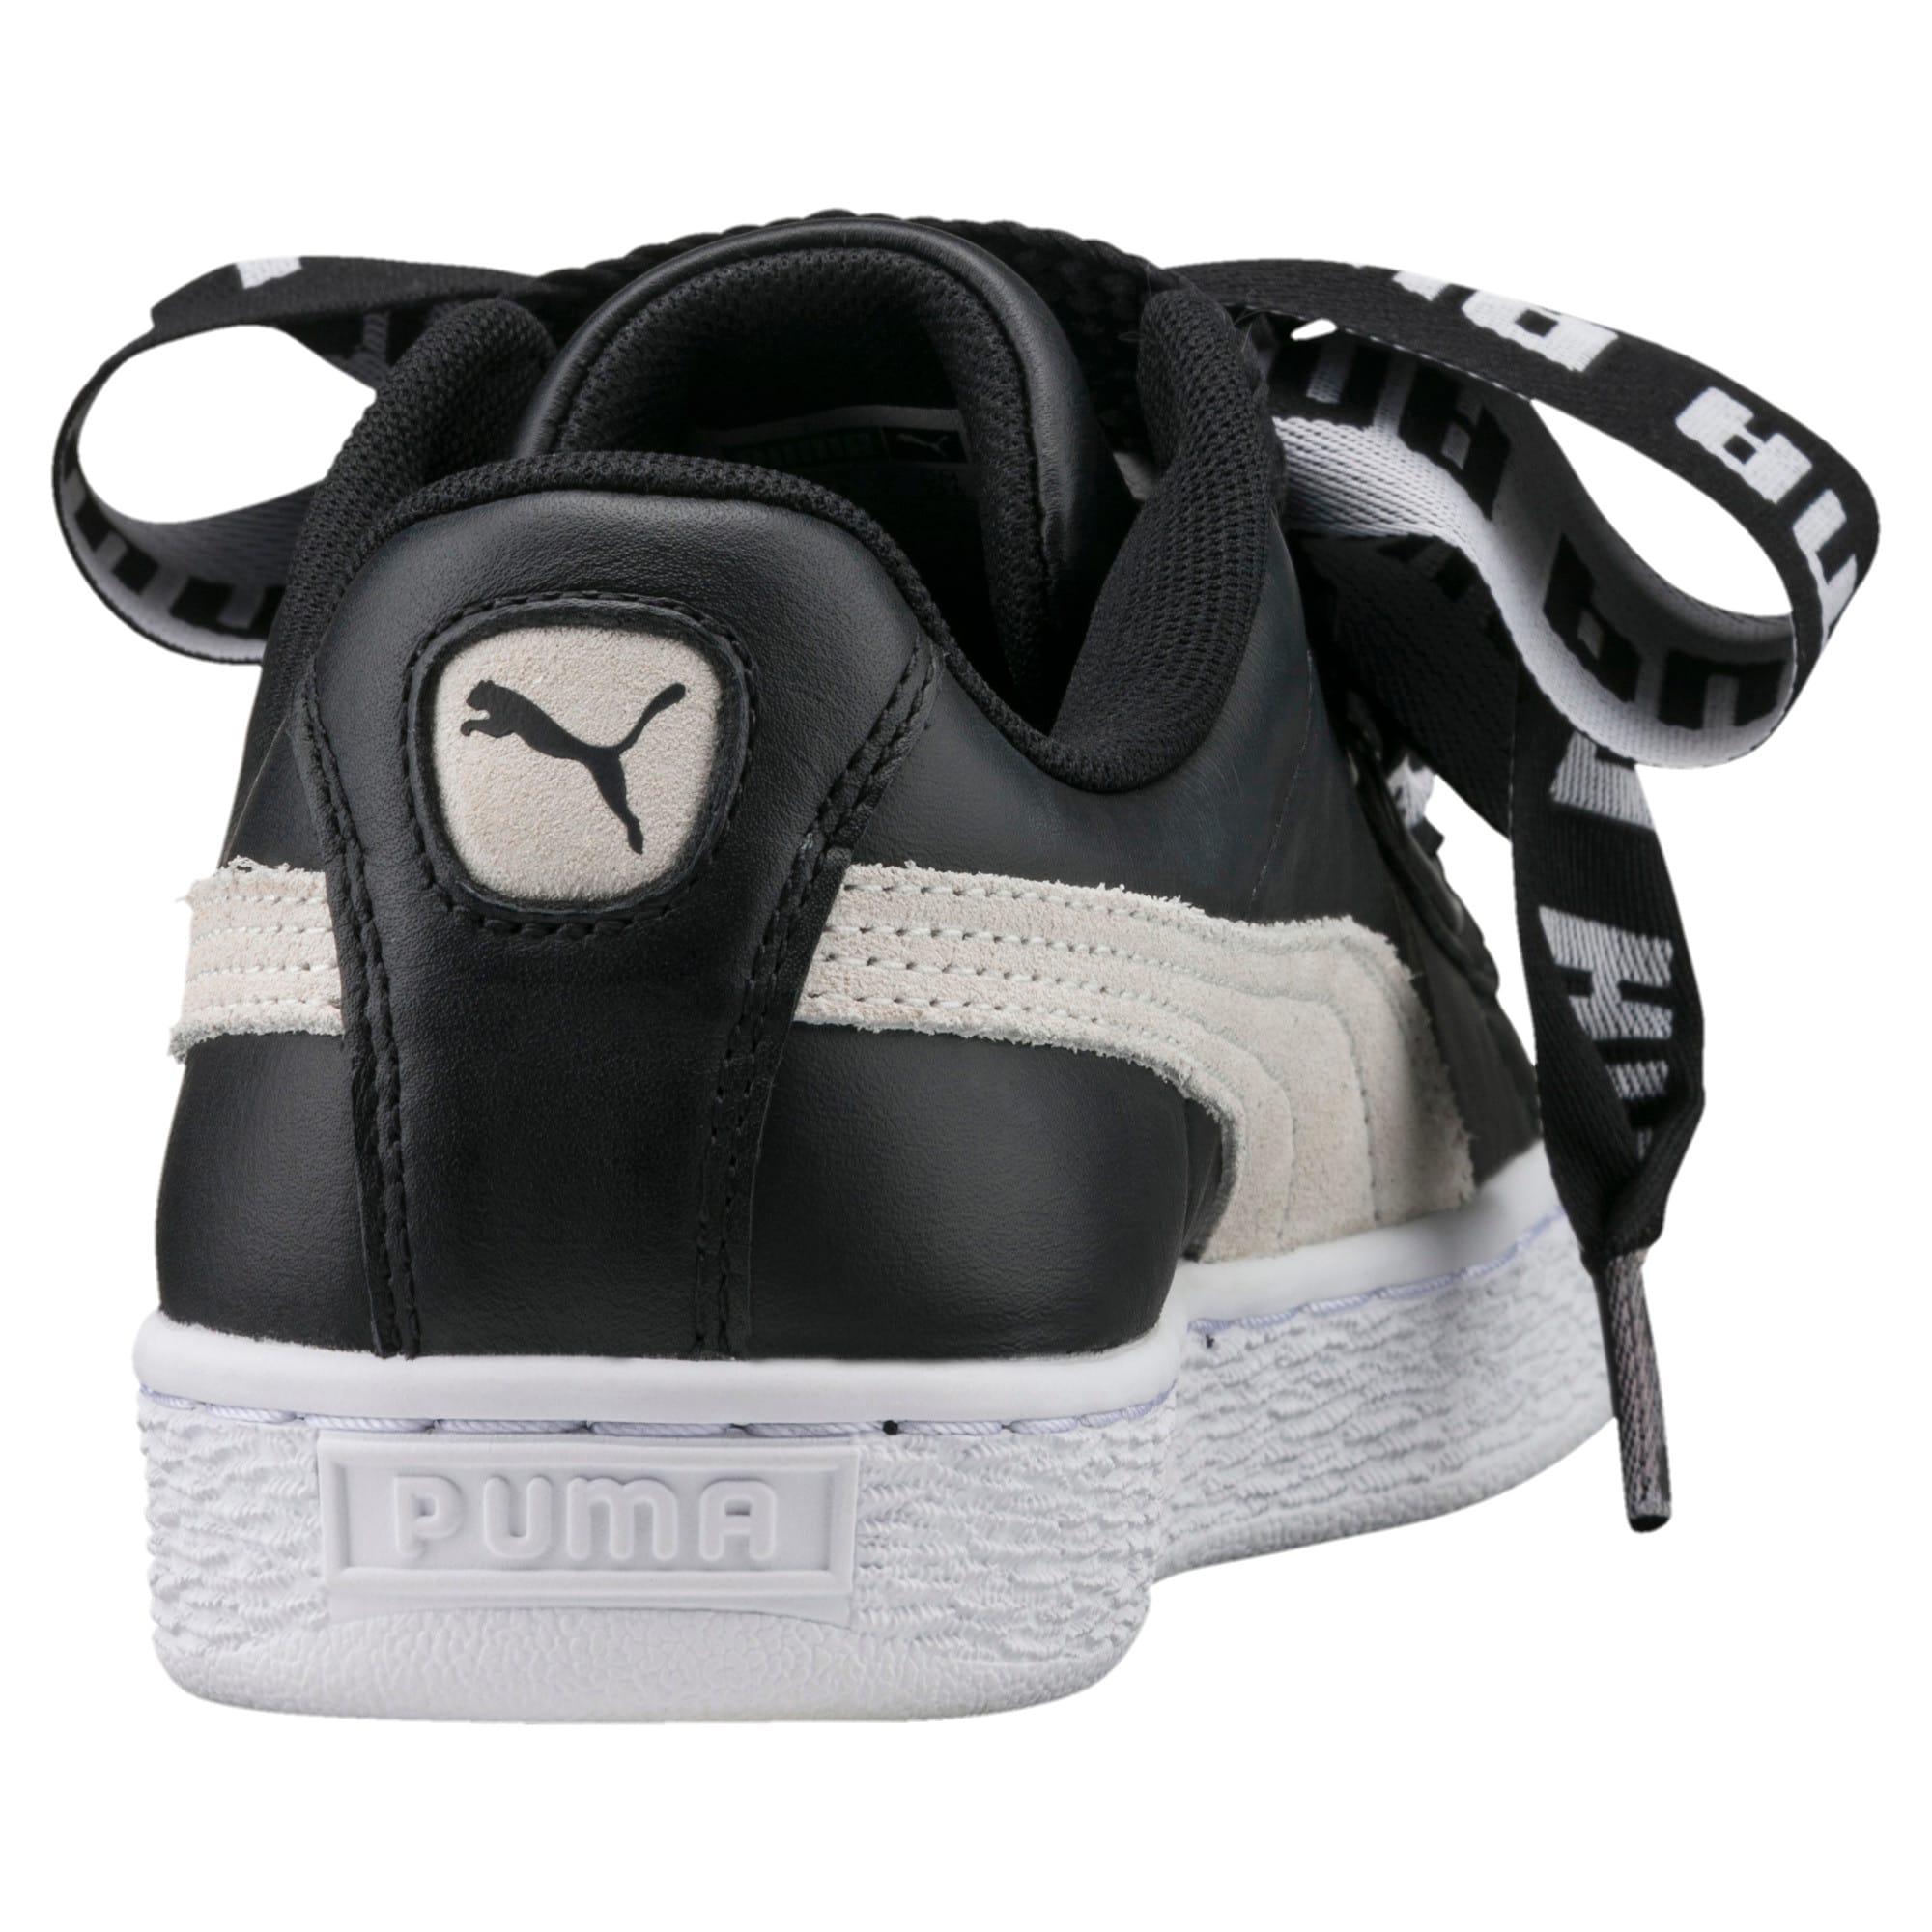 Thumbnail 4 of Basket Heart DE Women's Sneakers, Puma Black-Puma White, medium